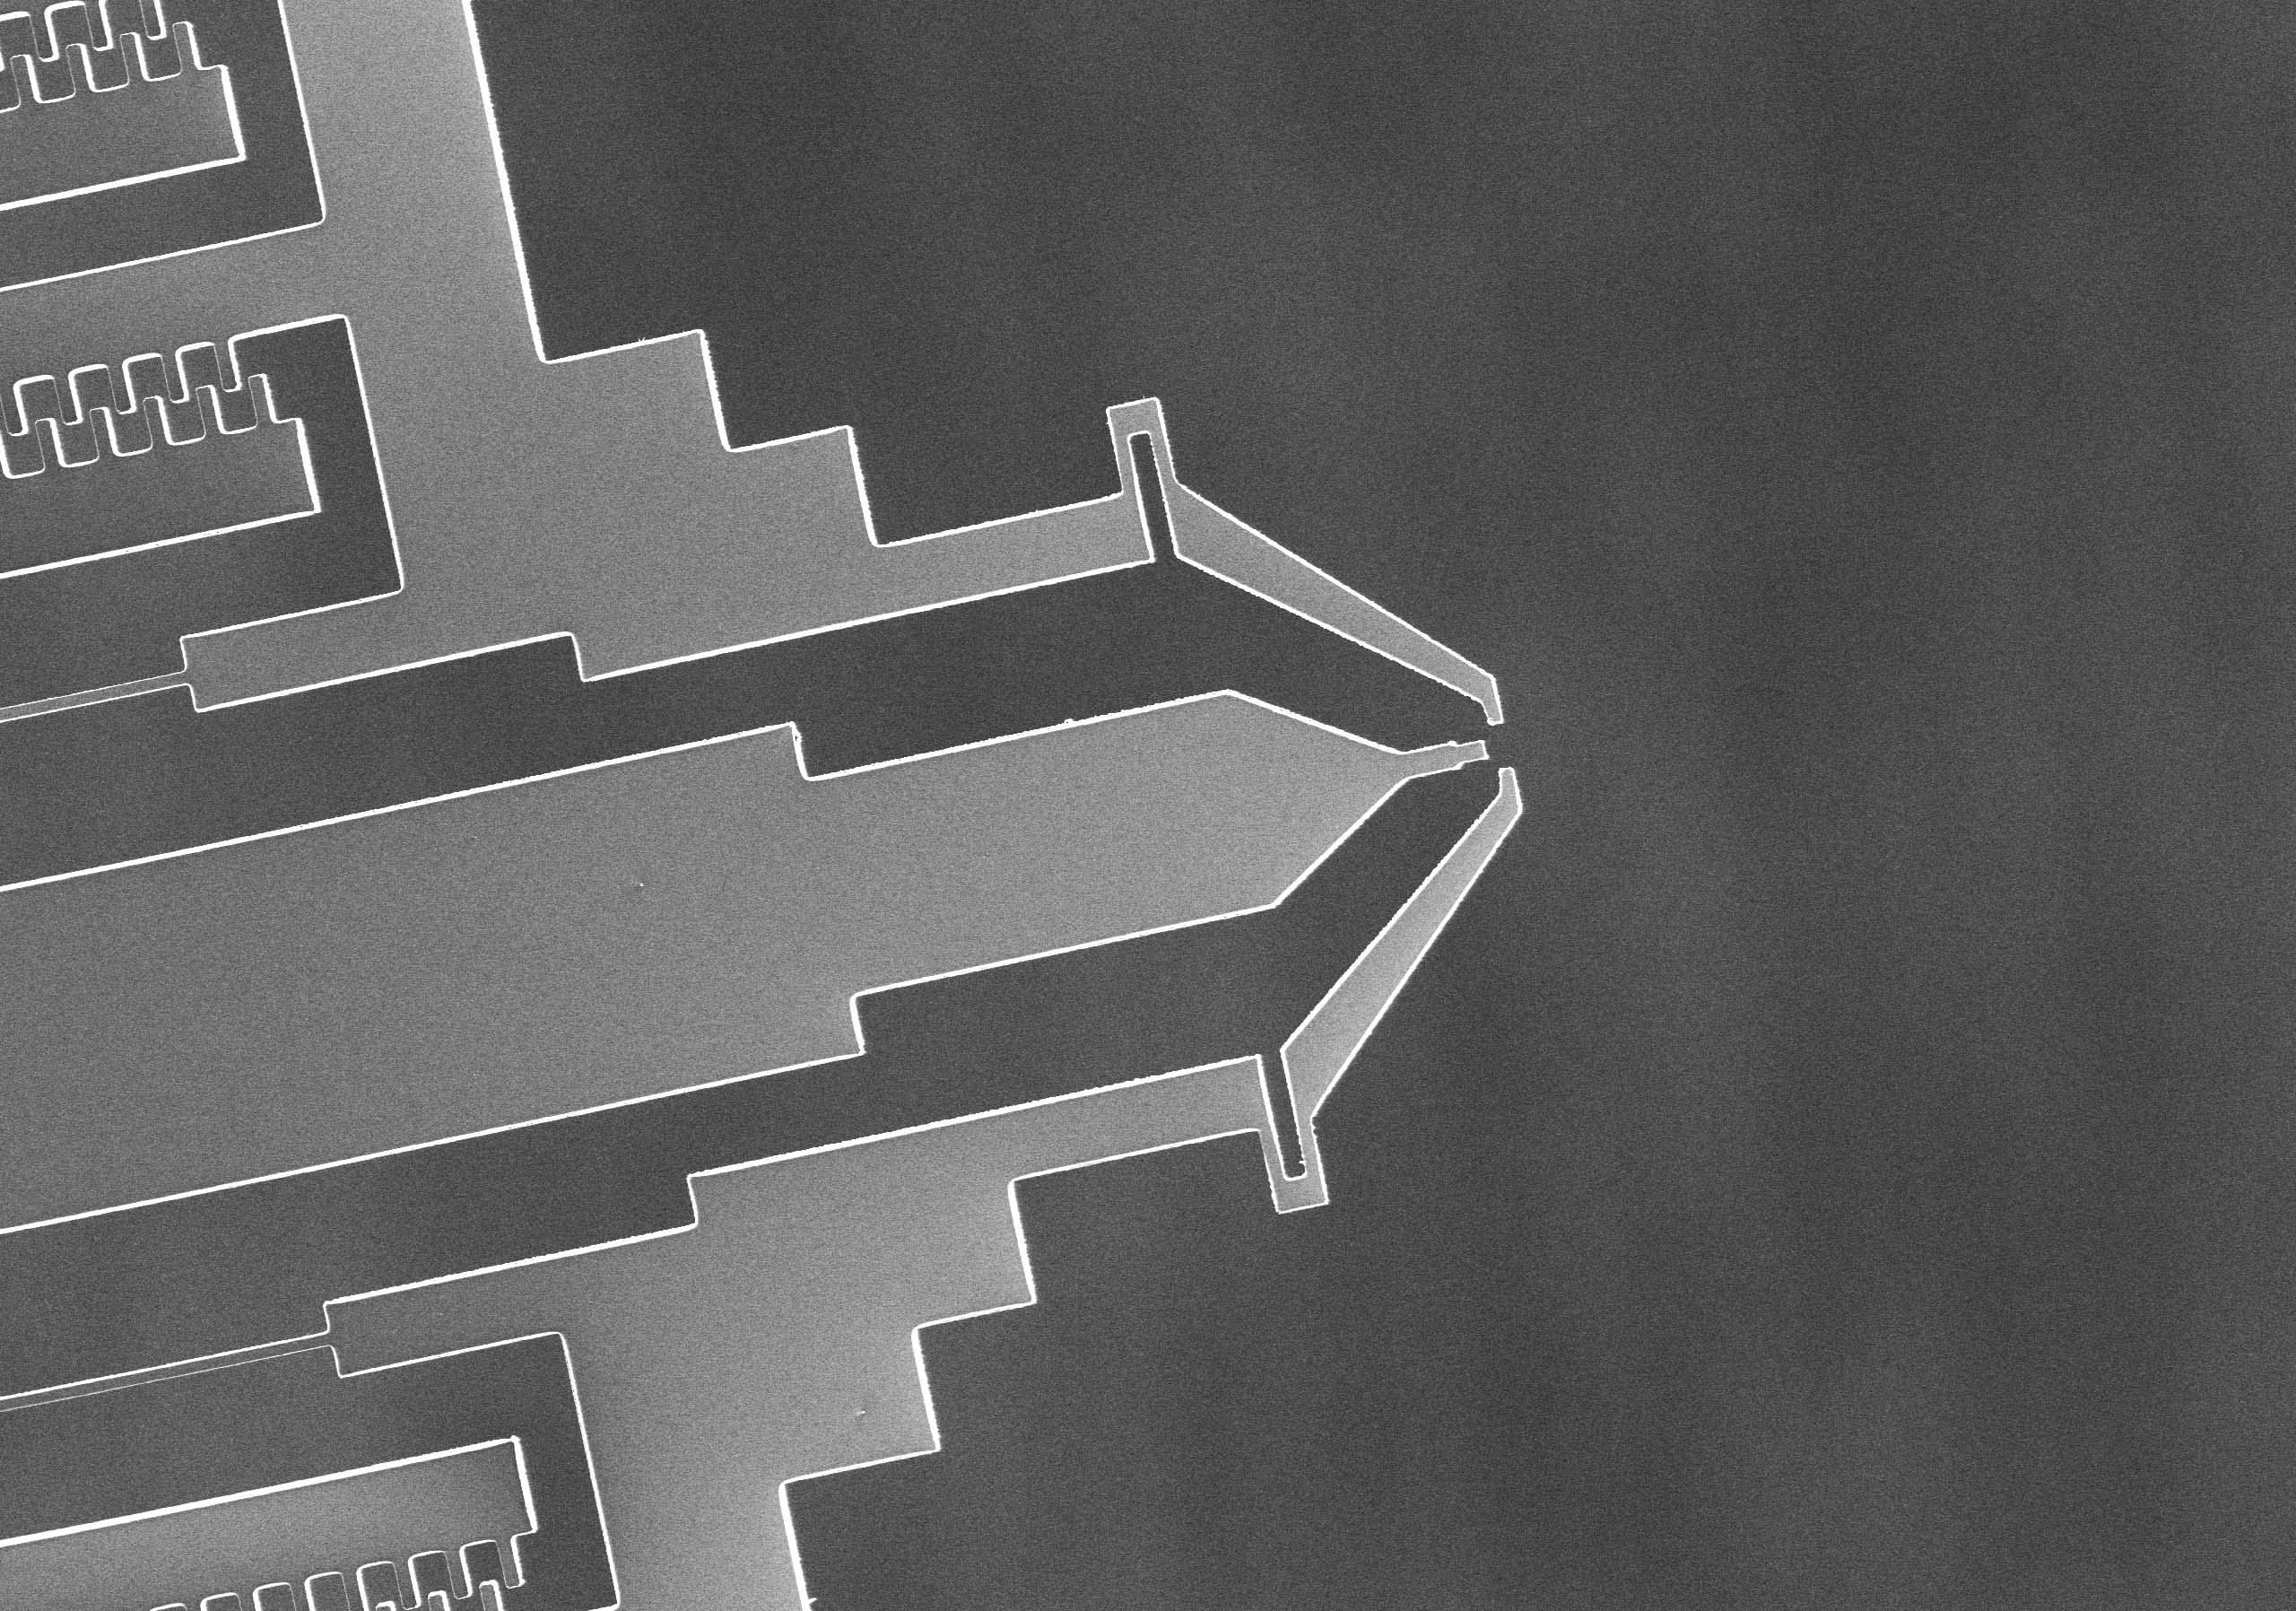 gripper tip, nano instrumentation